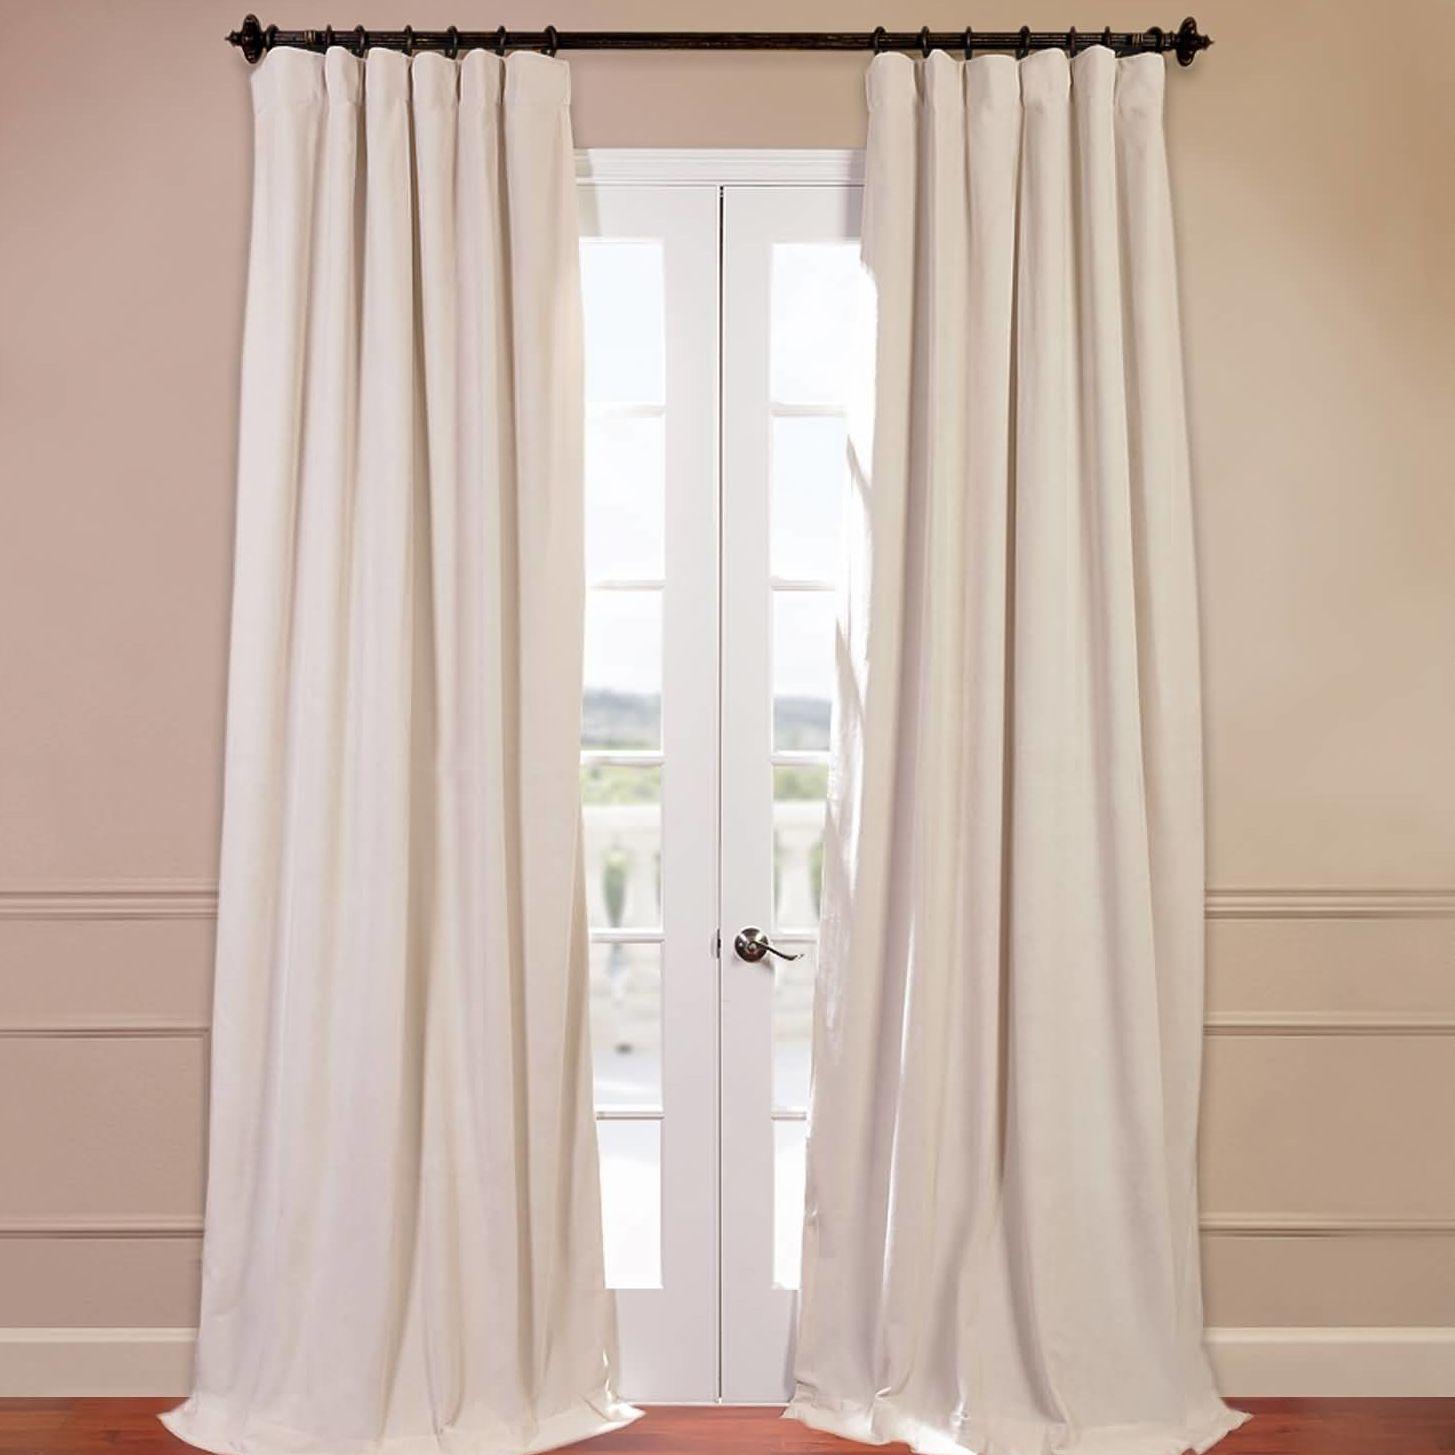 Signature Blackout Velvet Curtain Panel Panel curtains